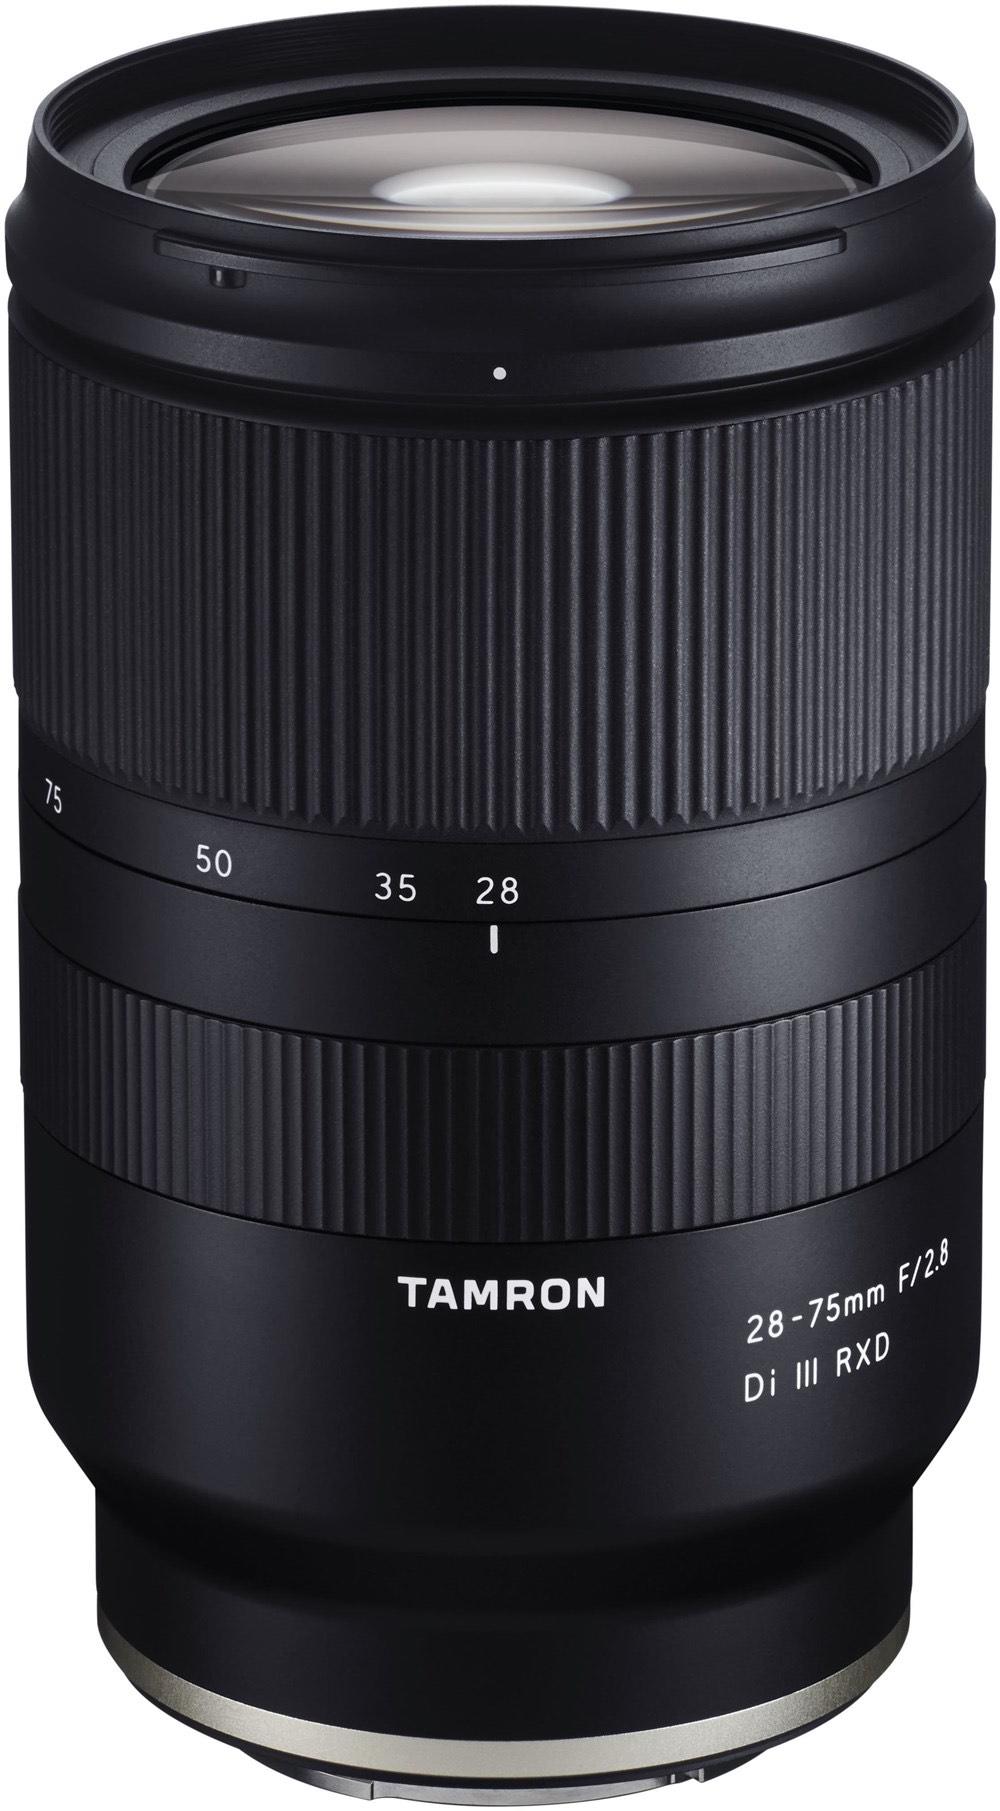 Tamron AF 28-75mm F/2.8 Di III RXD Sony